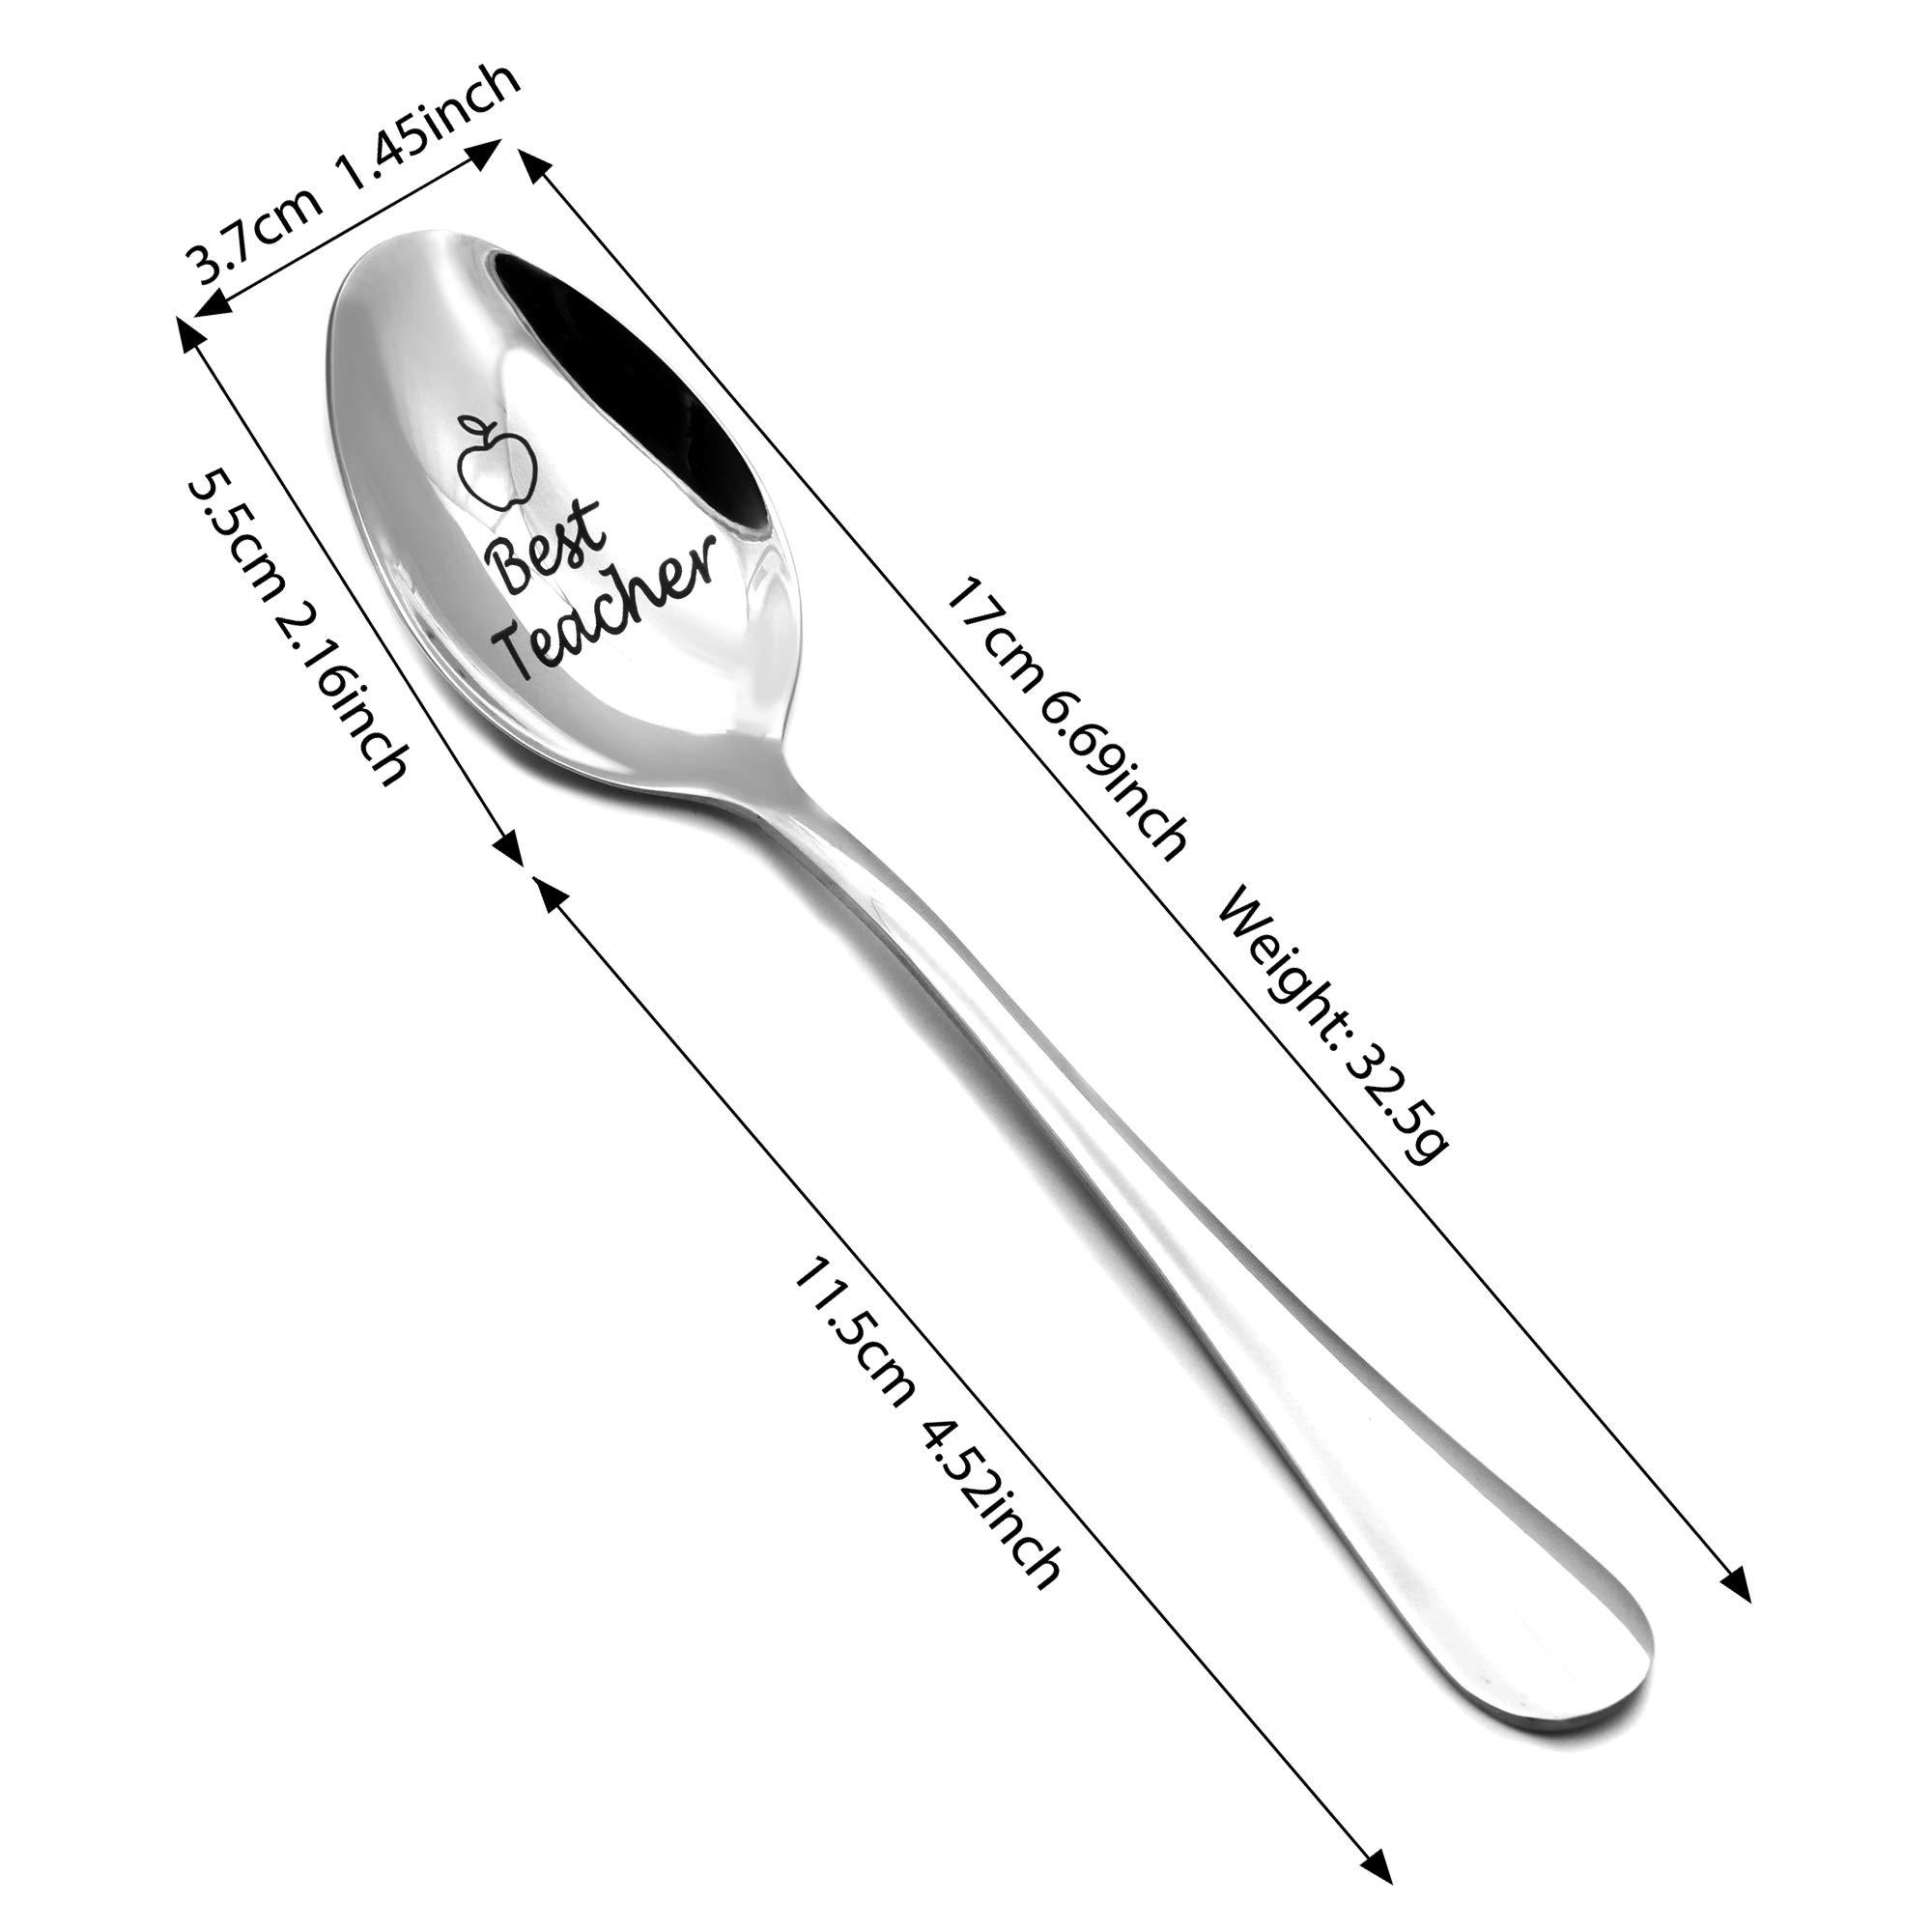 Thank You Teacher Graduation Teachers Day Gifts from Students Soup Spoon,Dinner Spoon Tea Spoon,Coffee Spoon,Ice Cream Spoon 304 Stainless Steel #1 Teacher